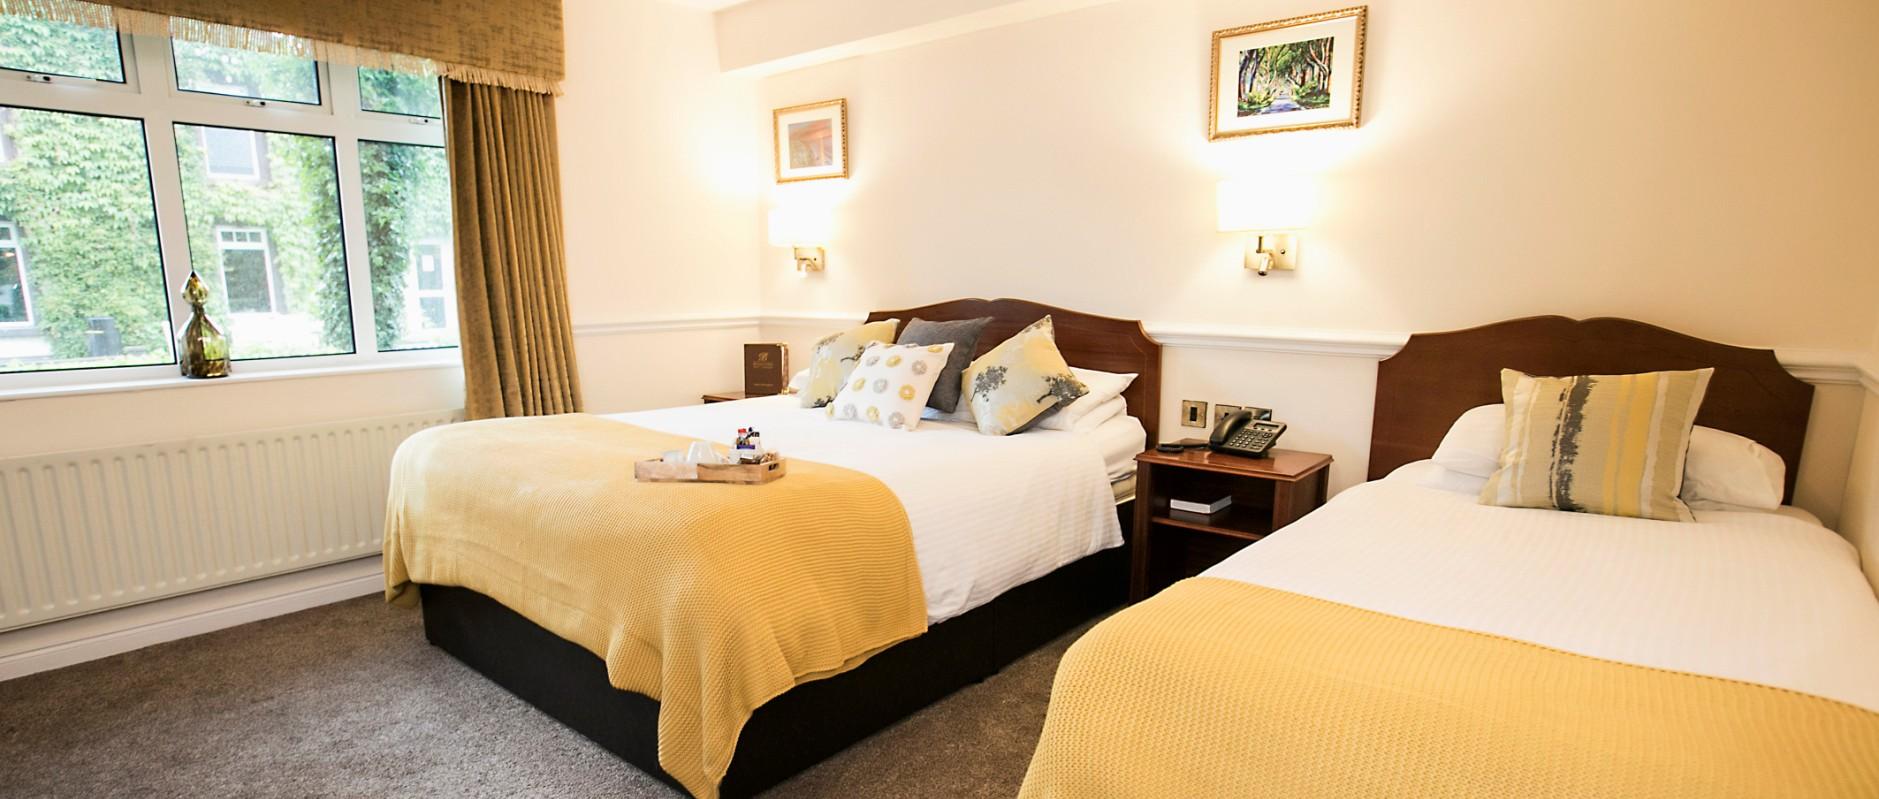 Superior Suite Bushtown Hotel Accommodation Coleraine Room